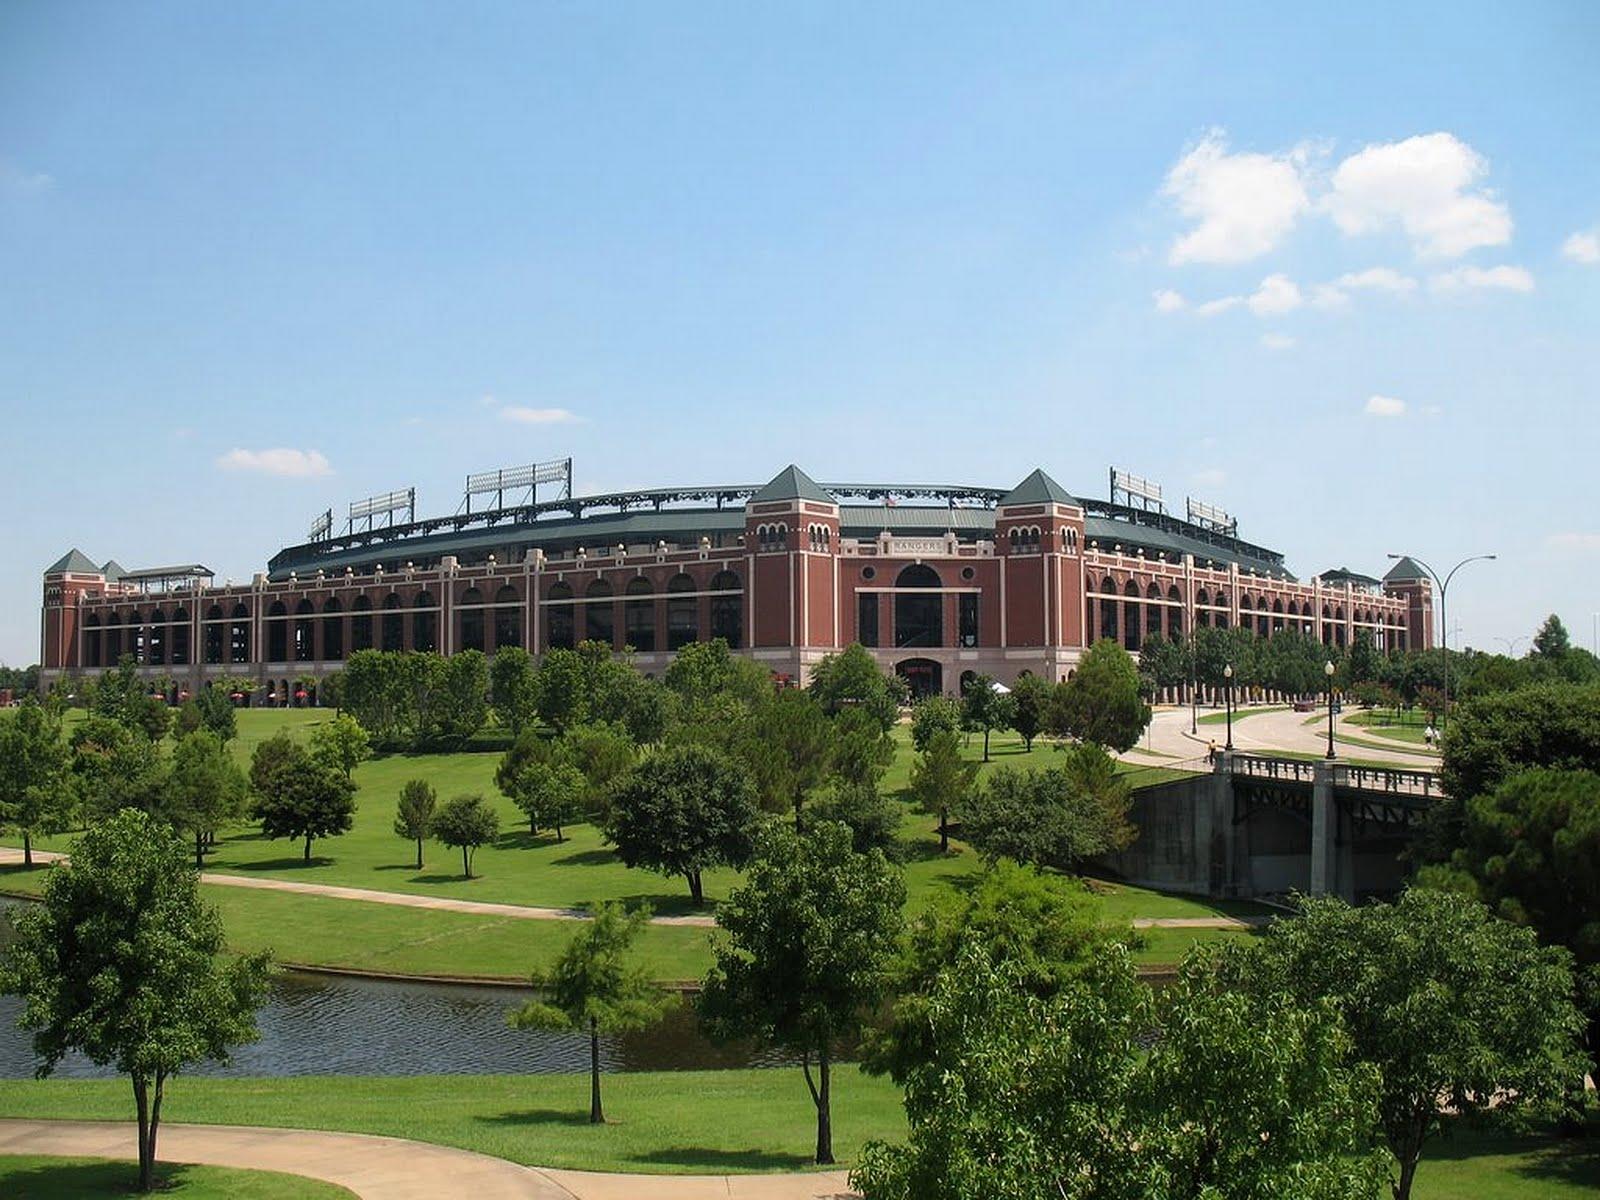 http://3.bp.blogspot.com/_TZ4zYEBSw1I/TLoXZ3xnLpI/AAAAAAAANow/BWlOHjcm9dM/s1600/Rangers_ballpark_in_arlington_2.jpg